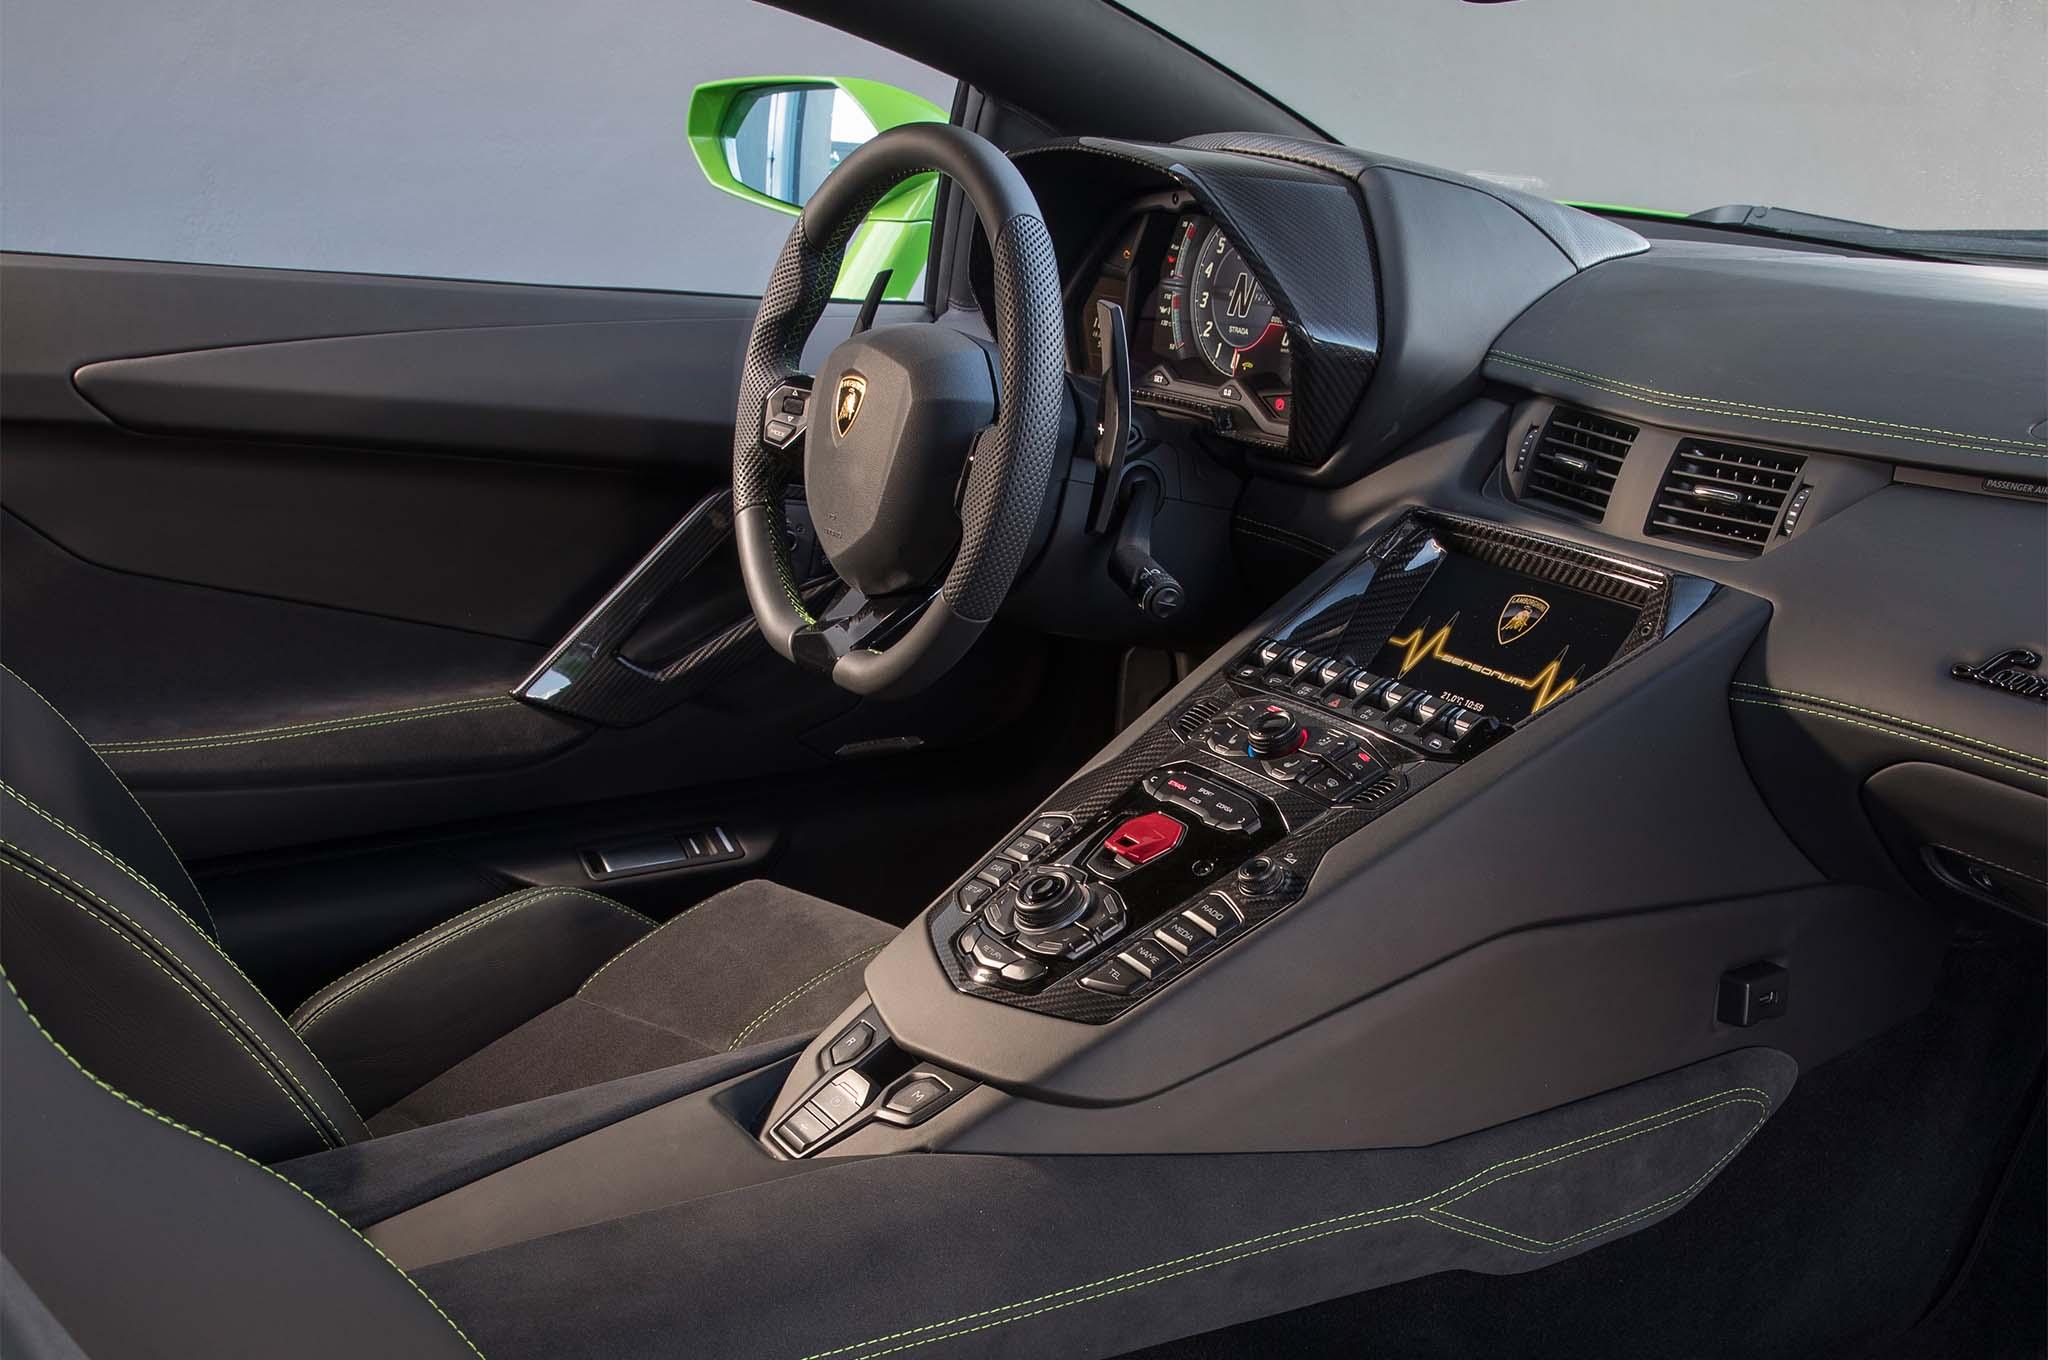 2018 Lamborghini Aventador S Interior 02 1 Motor Trend En Espanol